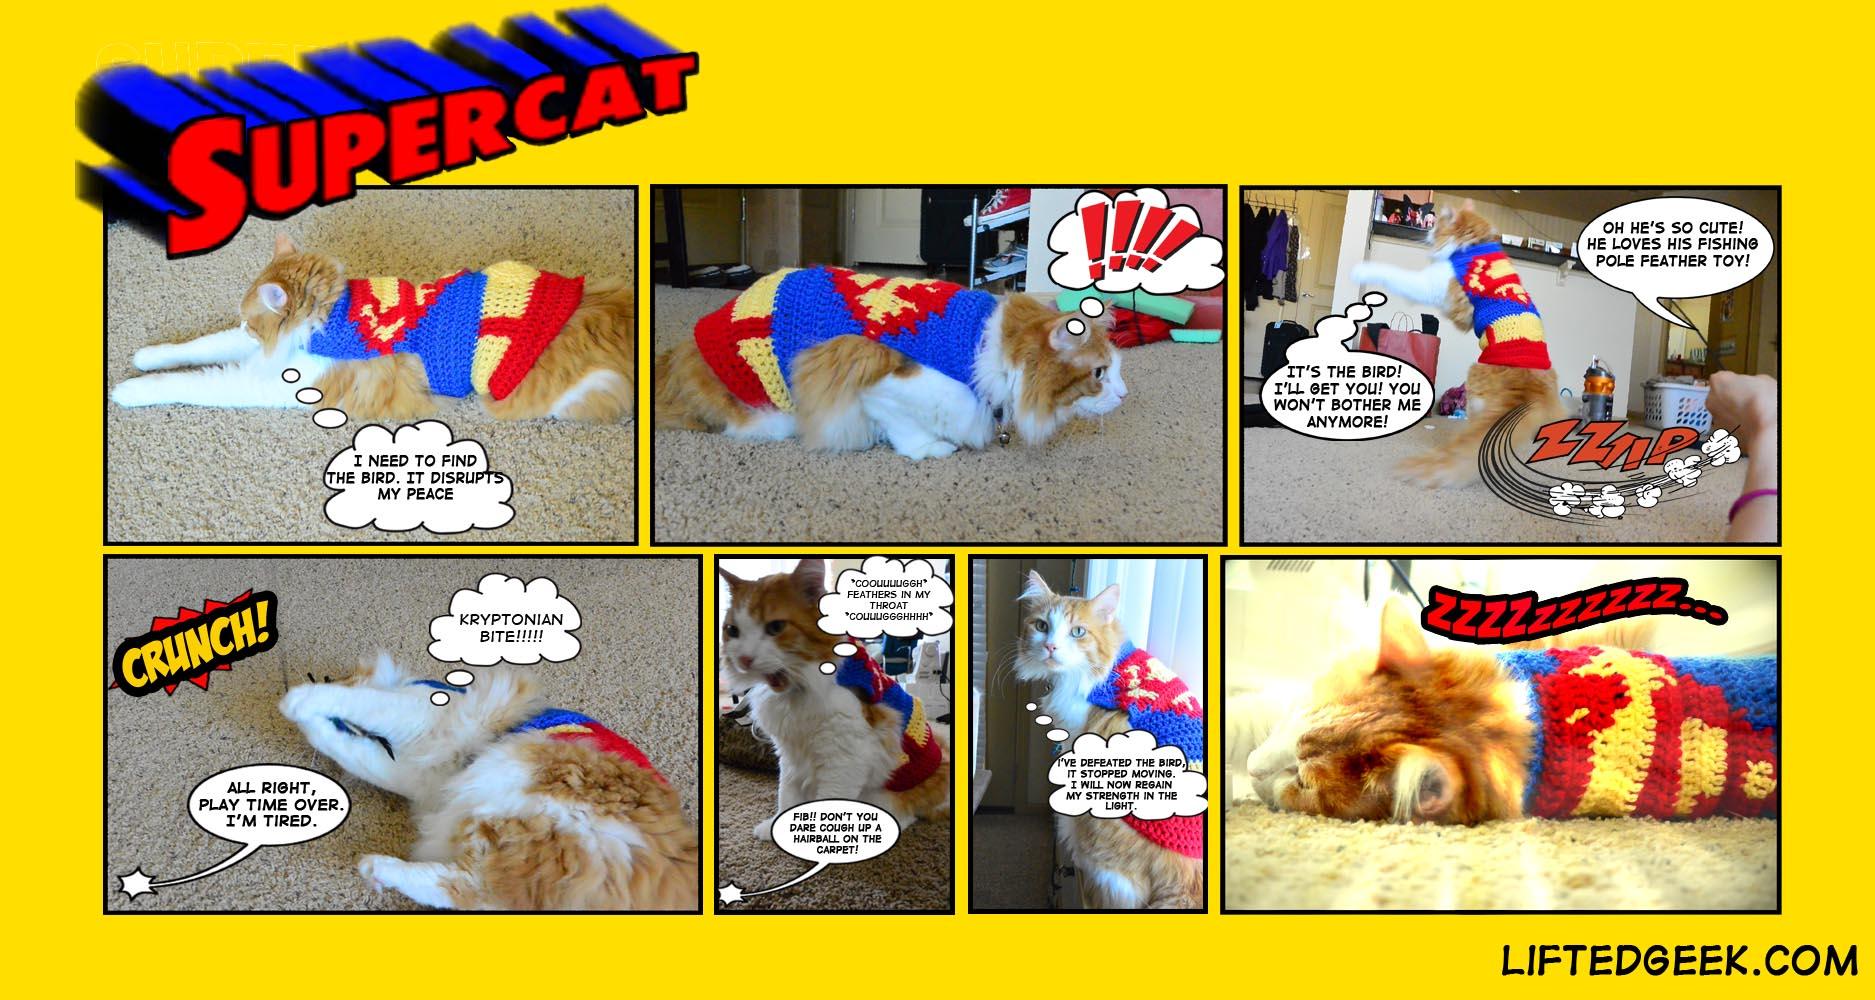 SuperCatcomicstrip copy.jpg